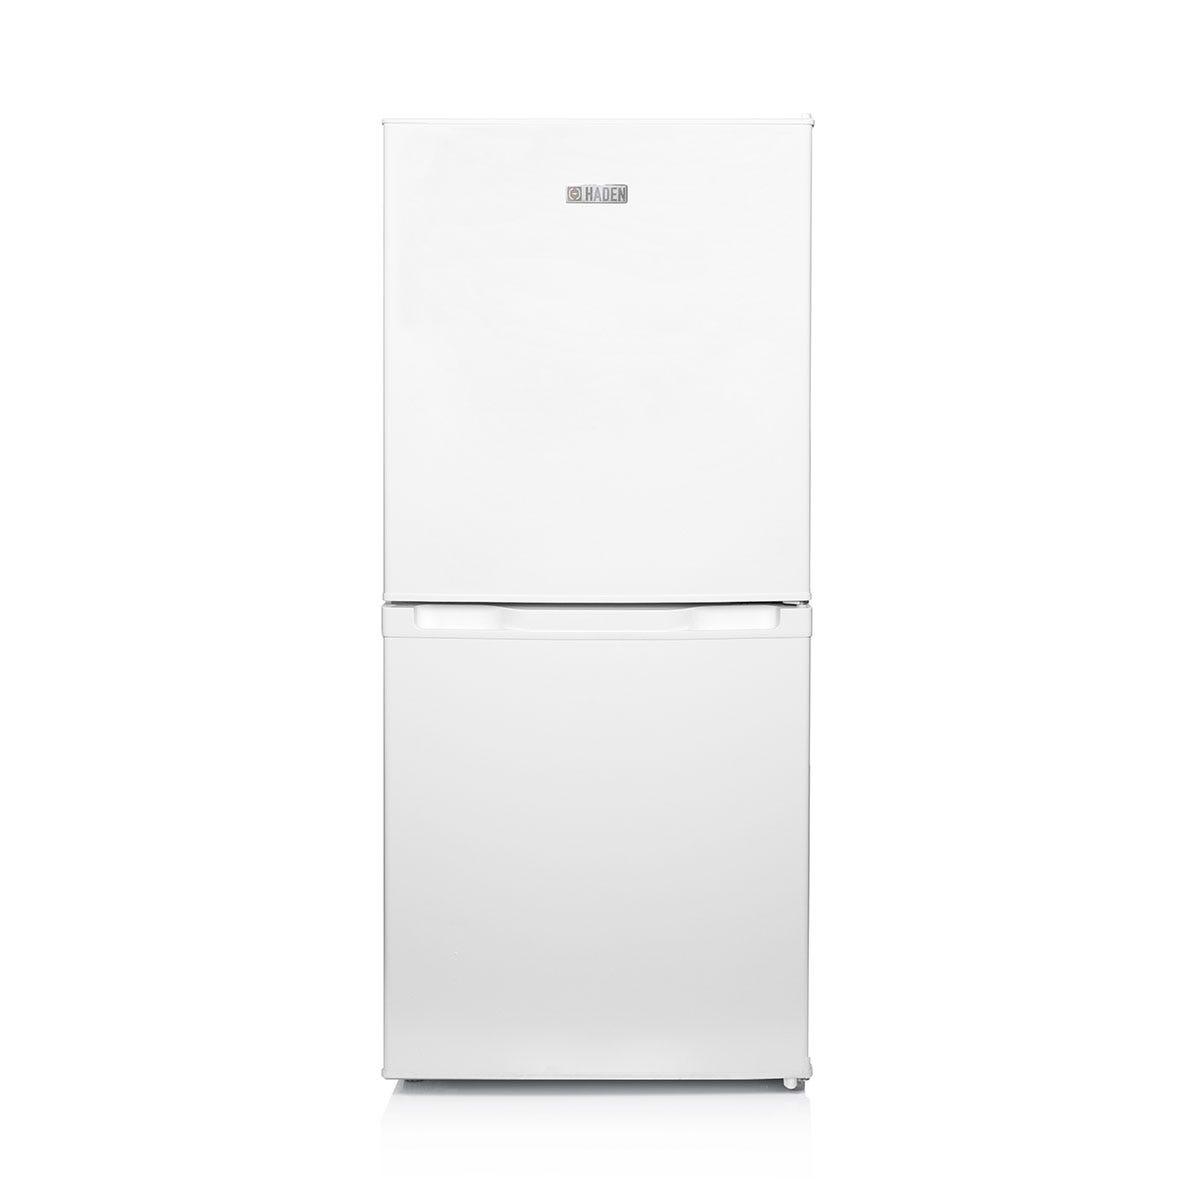 Haden HK122W 50cm 50:50 Split Fridge Freezer - White